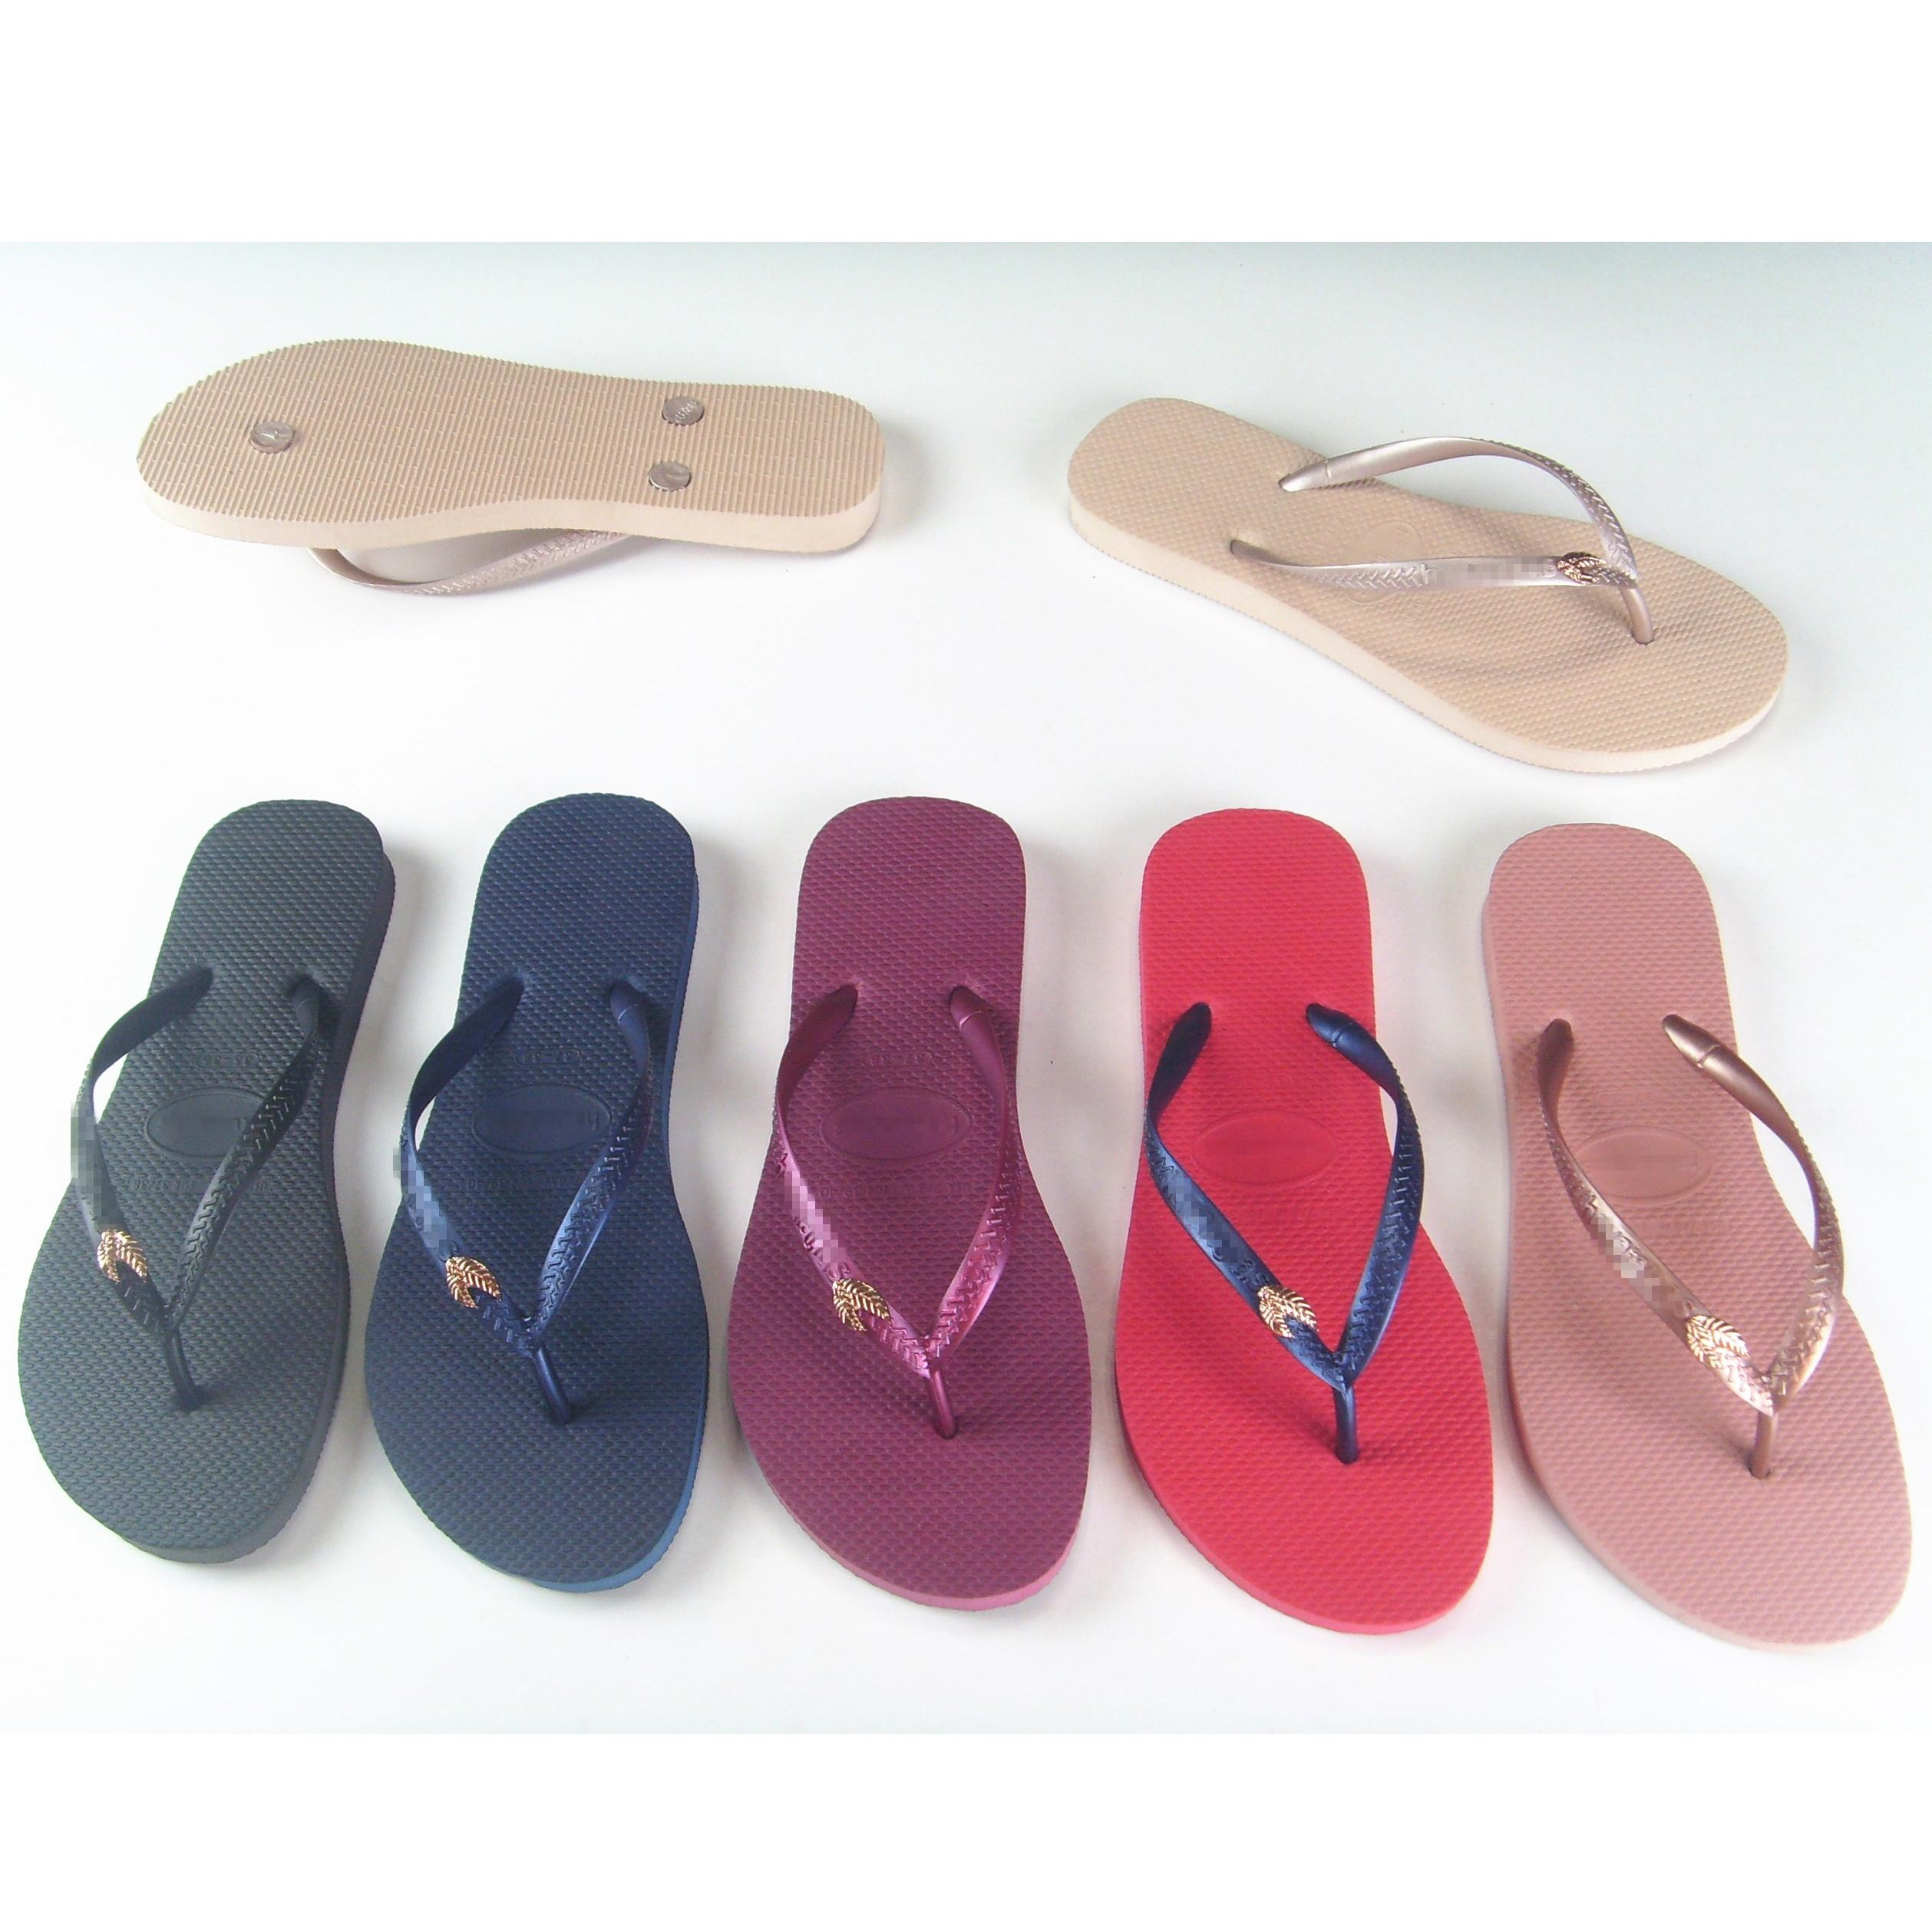 396f8de5dc18 Cari Kualitas tinggi Sandal Jepit Produsen dan Sandal Jepit di Alibaba.com